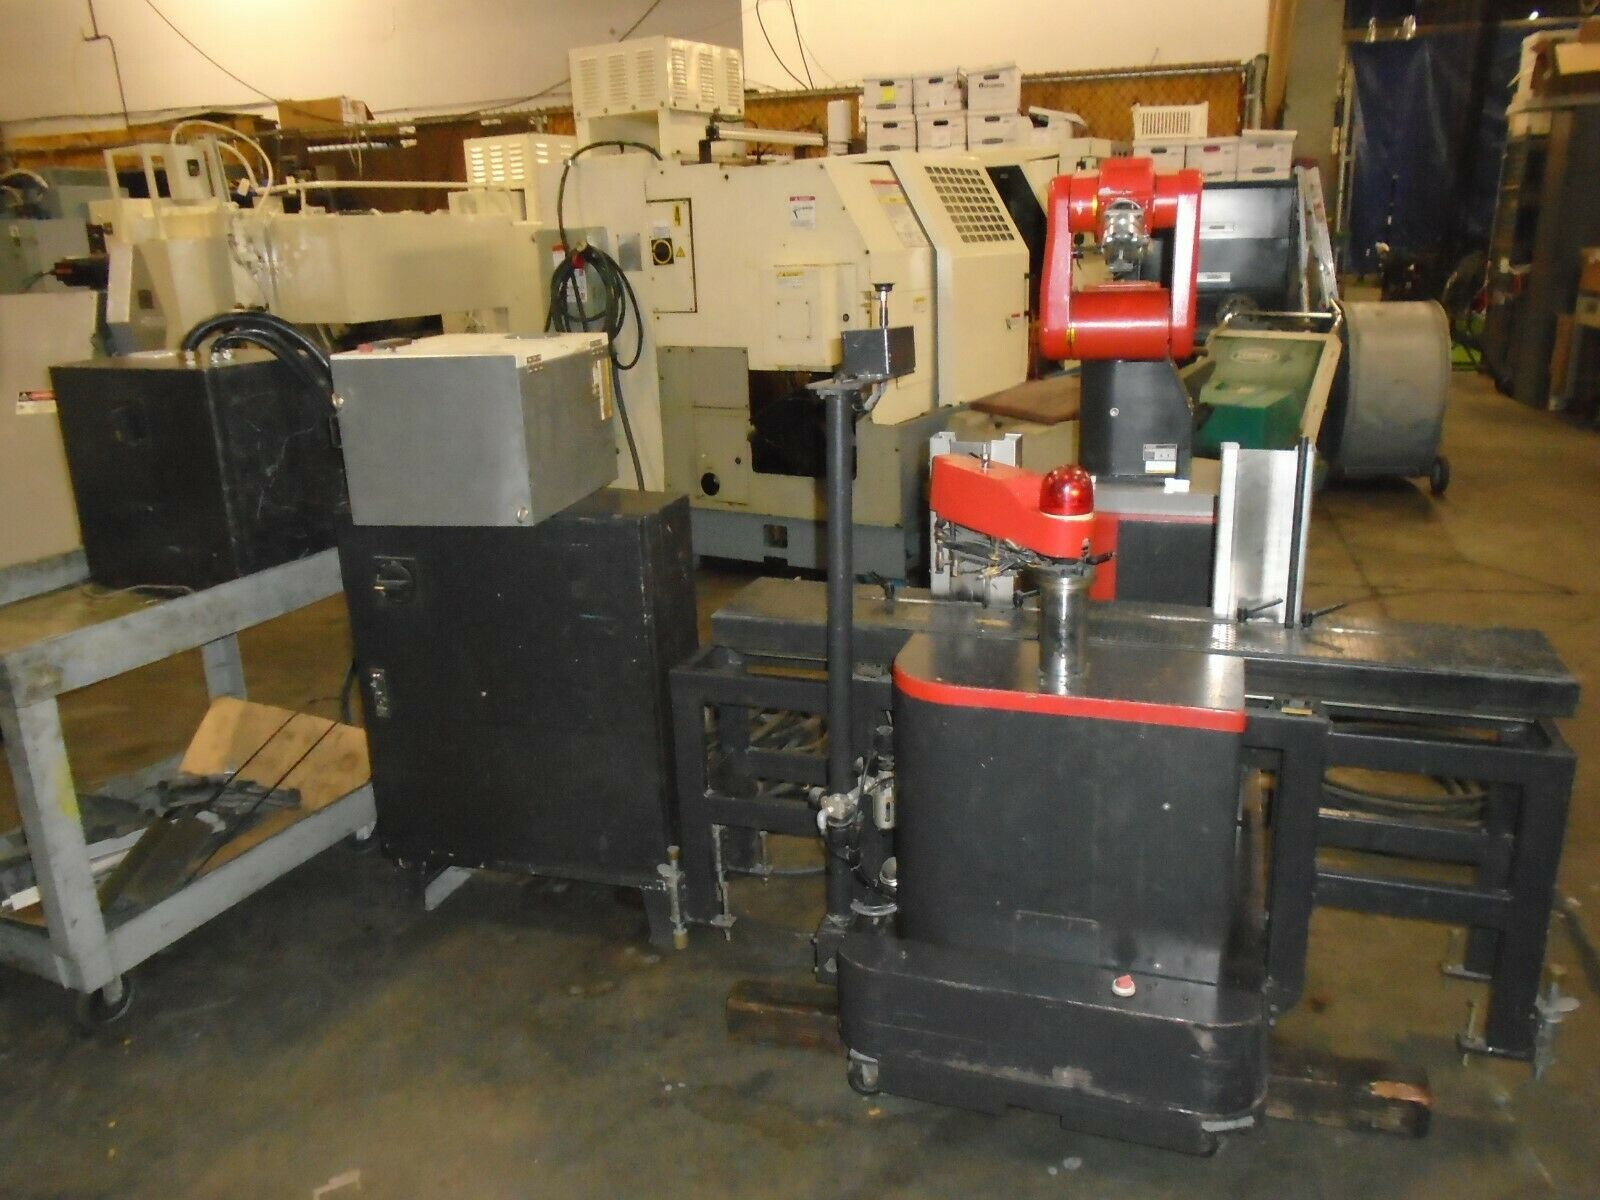 Fanuc Robot LR Mate 100 A5B-1131-8001 Mini Cel R-J2 Control